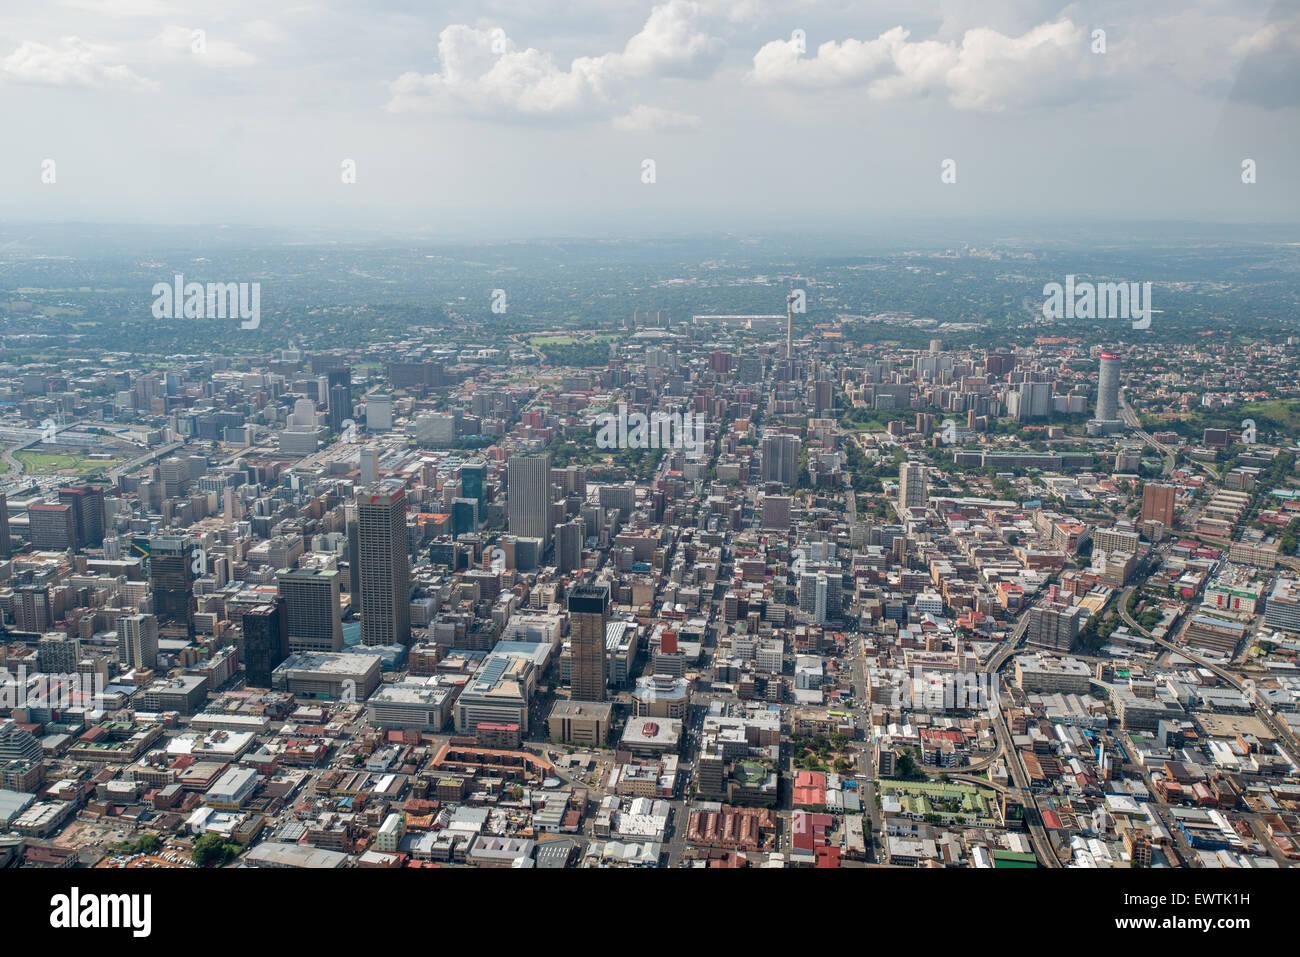 Sud Africa - Vista aerea di Johannesburg Immagini Stock